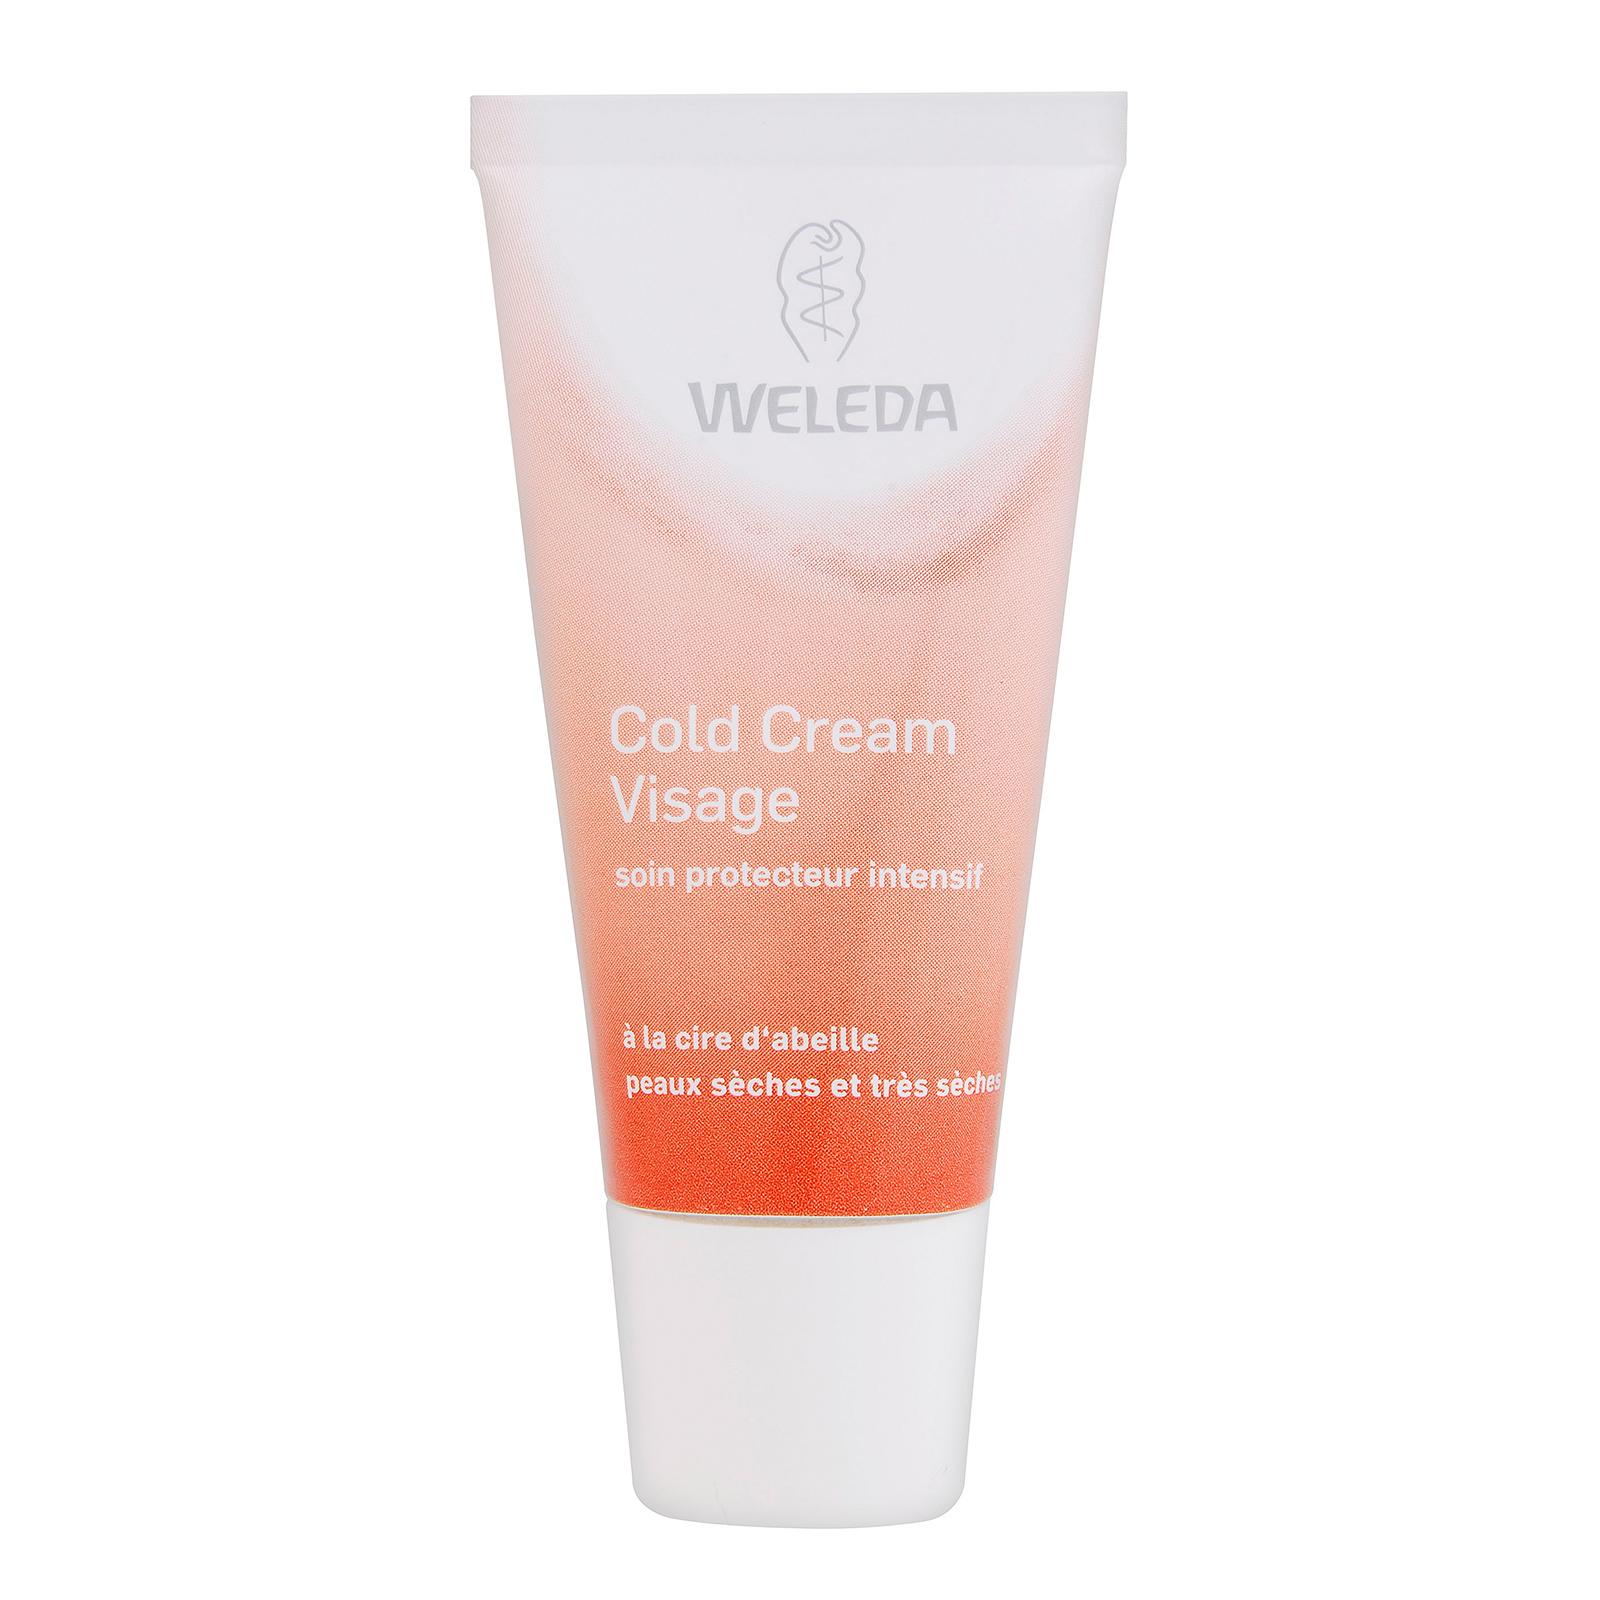 Weleda Cold Cream Visage 30ml,